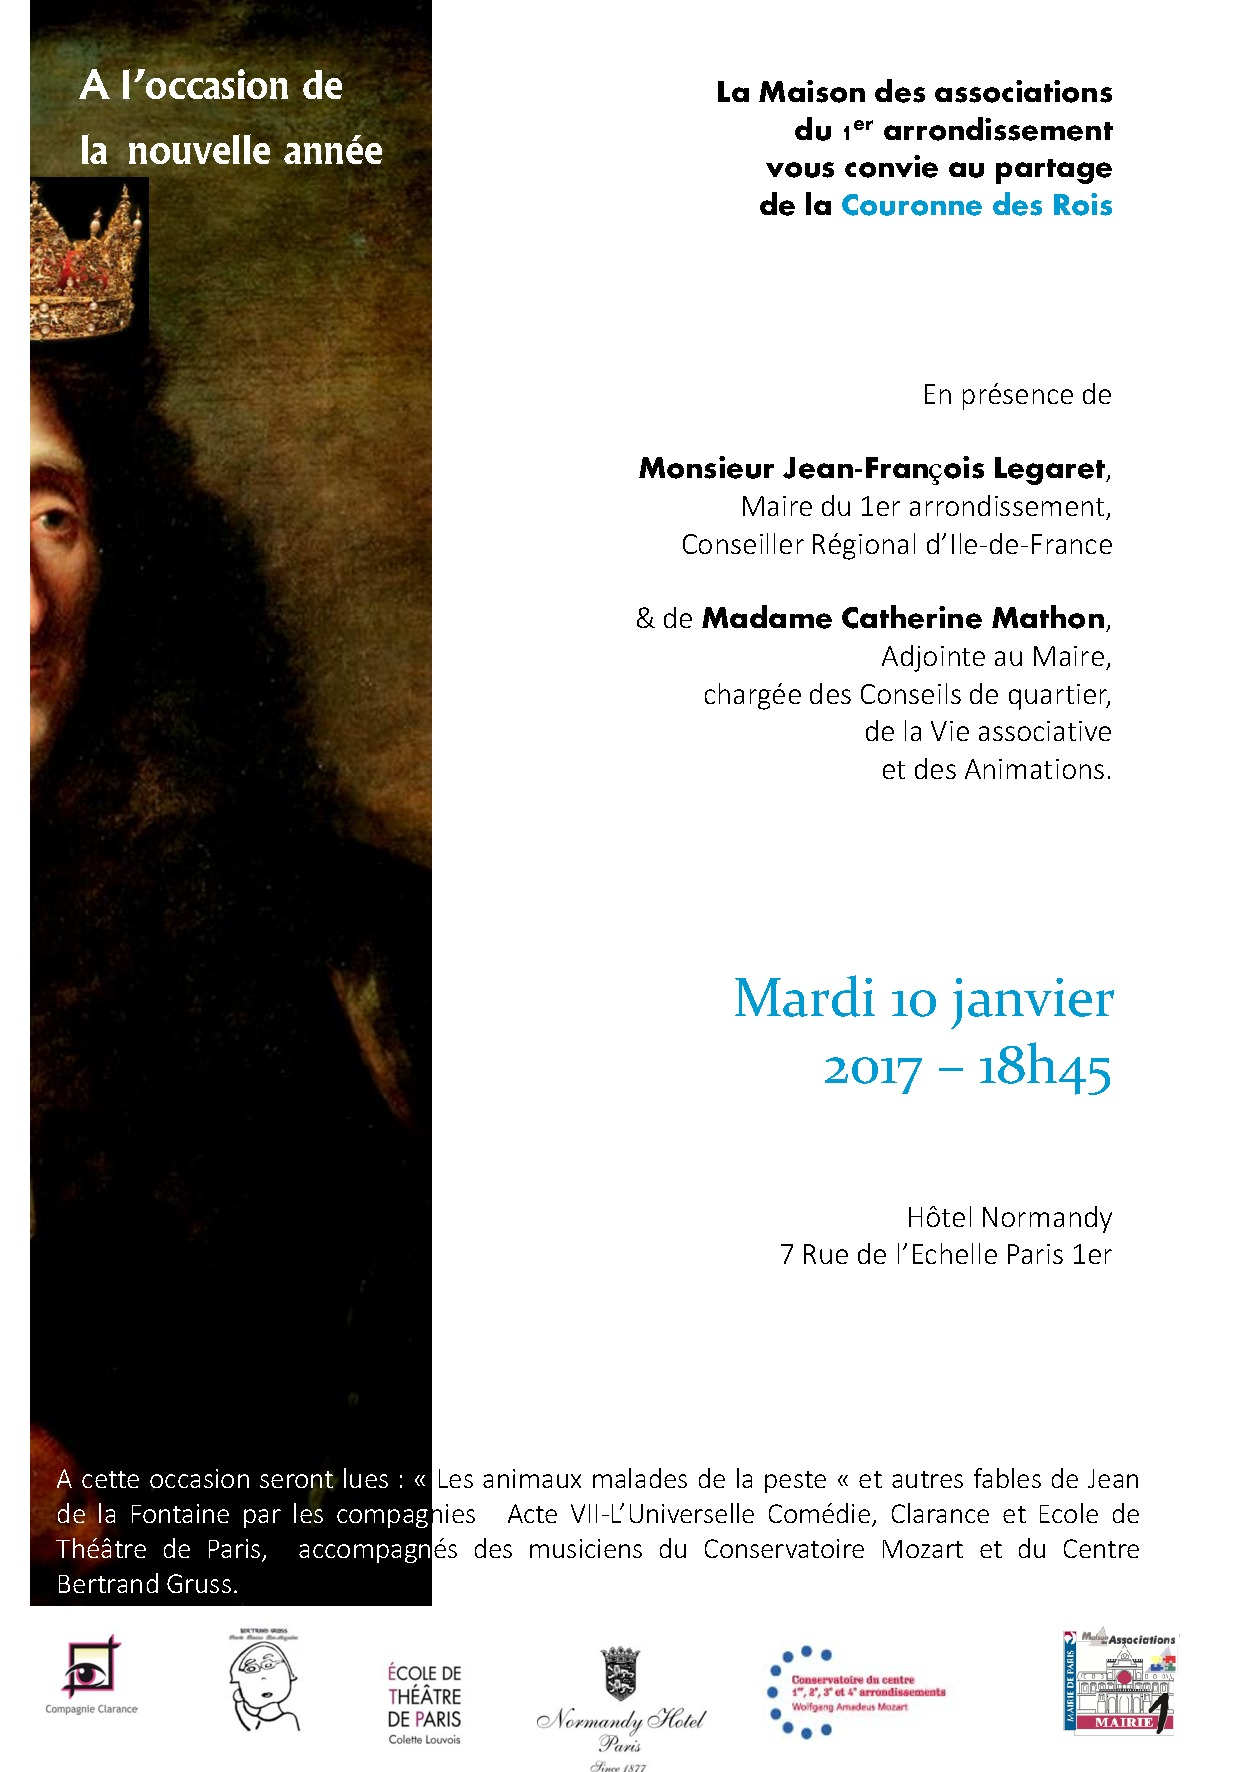 thumbnail of Galette des rois 2017-invitation